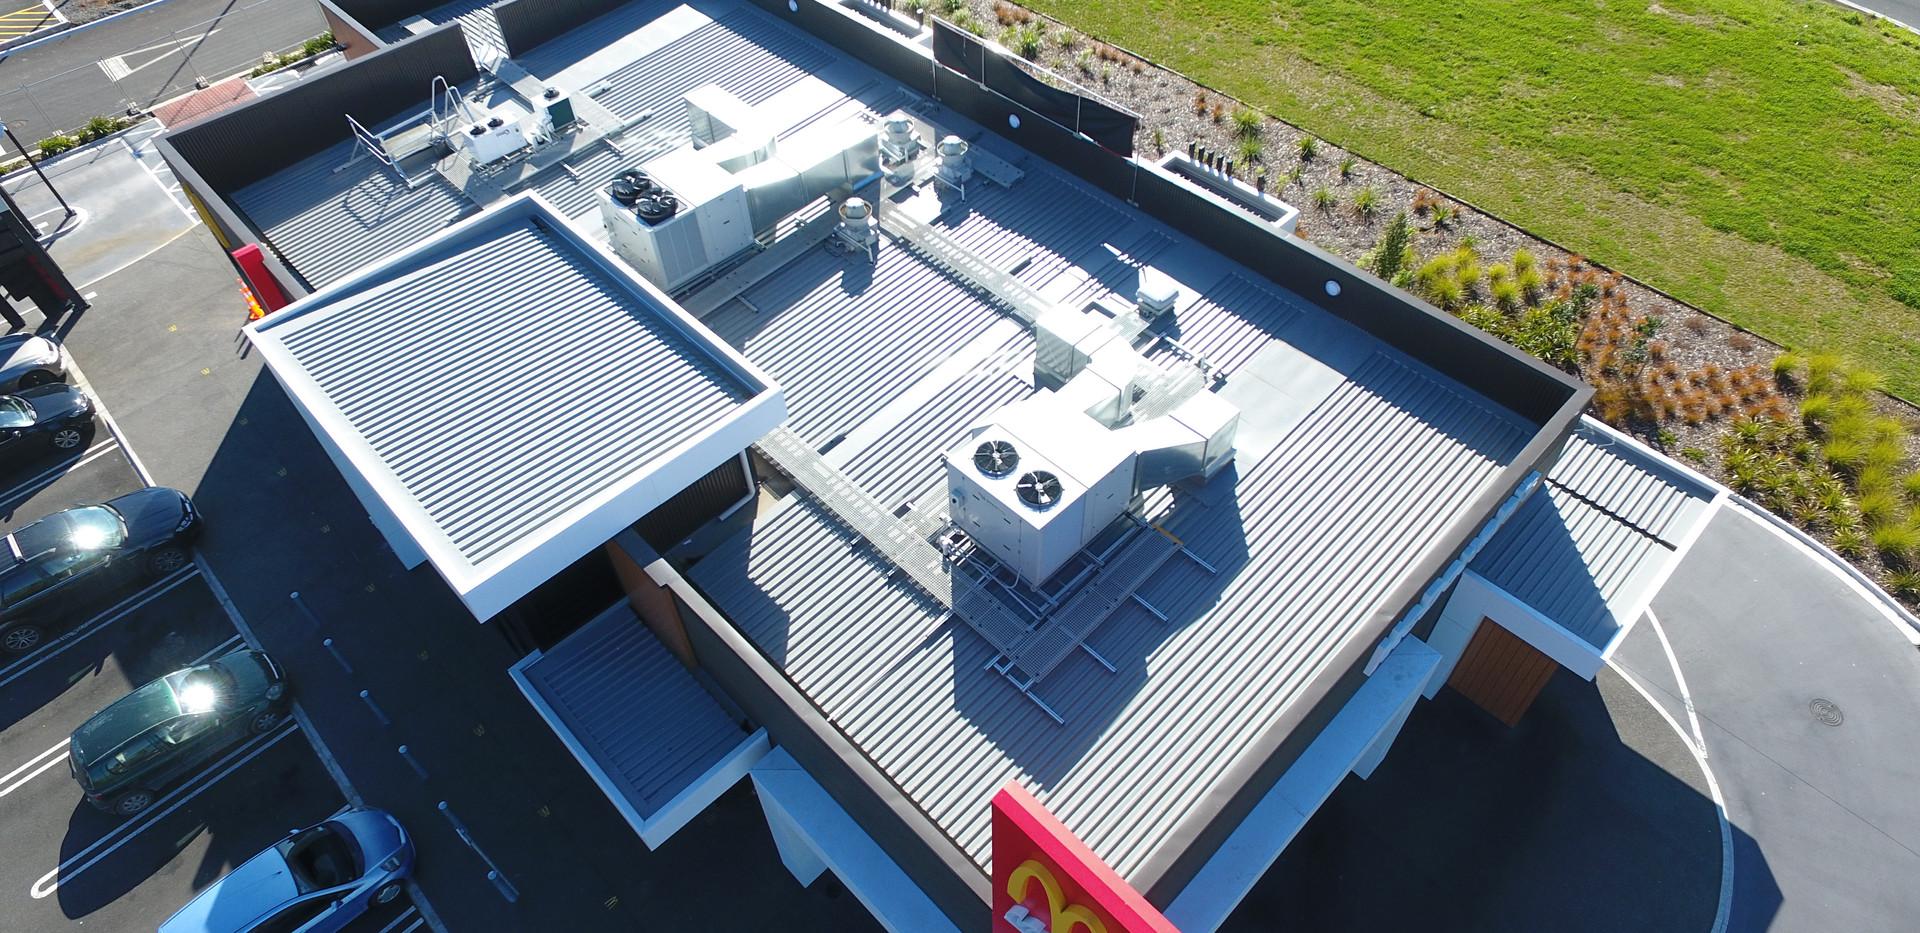 McDonalds Taupiri Architectural aluminium extruded wall panels. PVC membrane gutters Nu-Wall 2